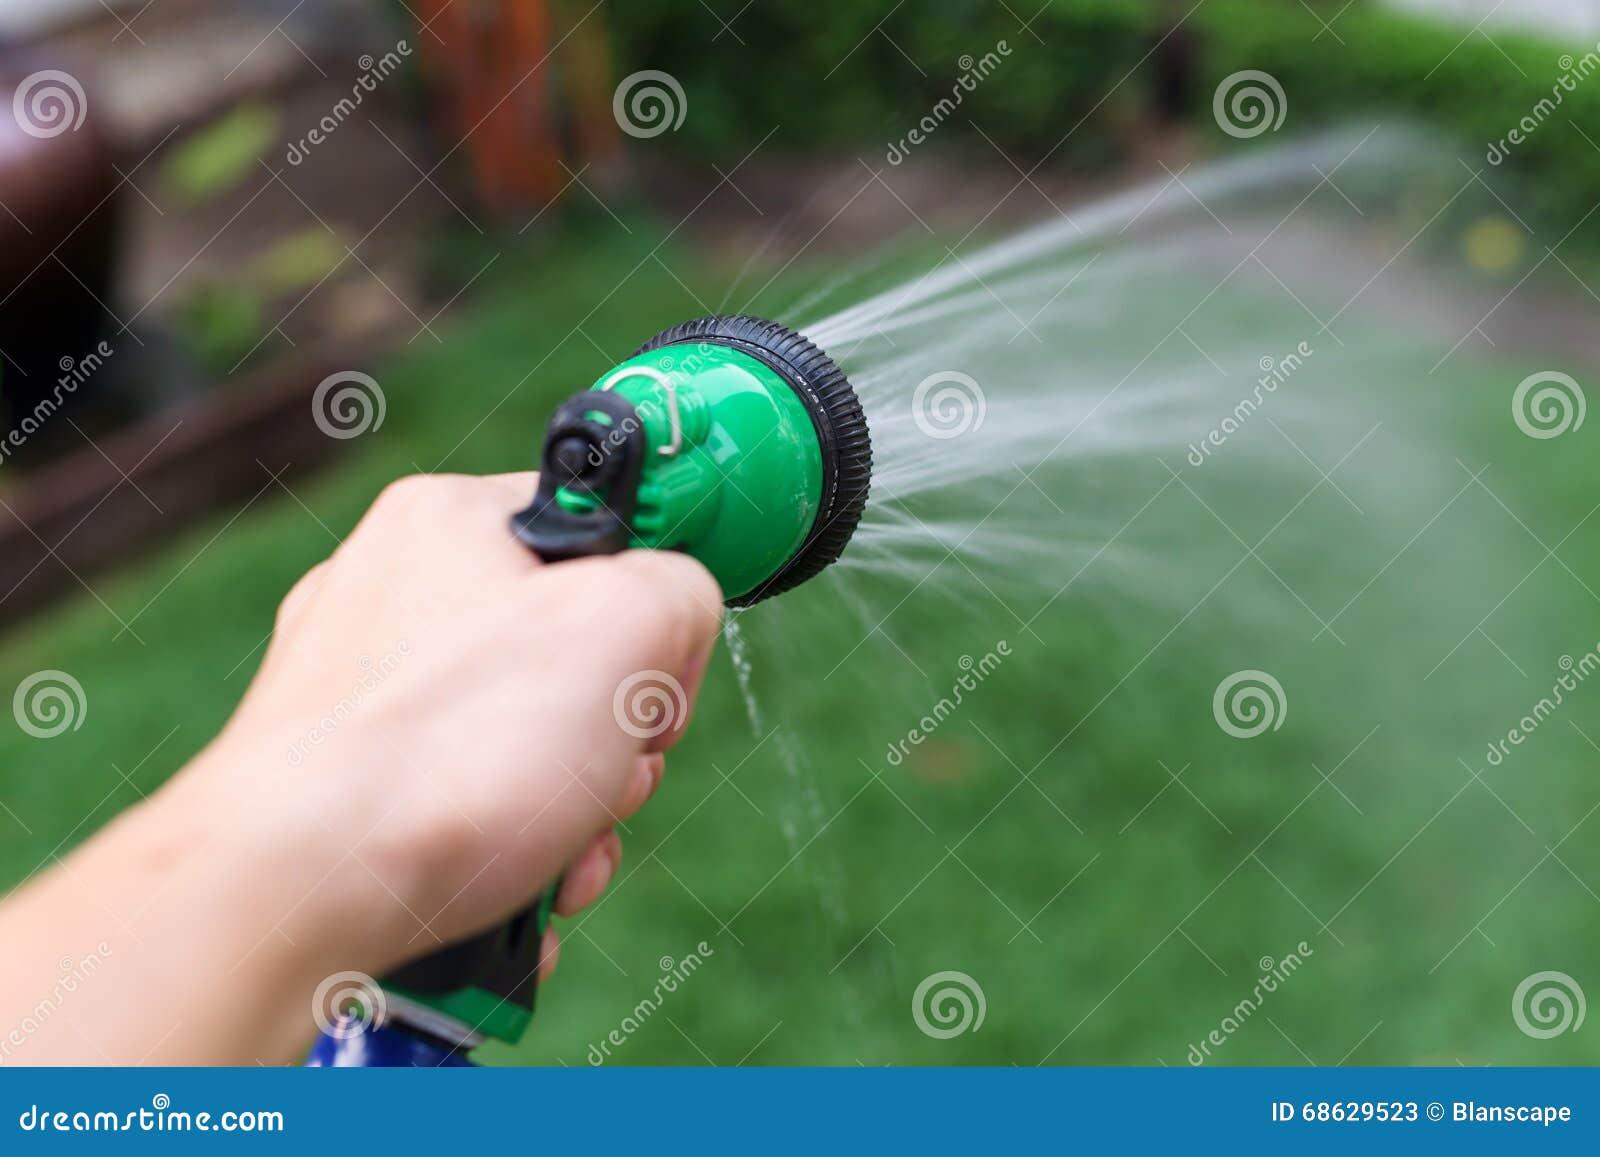 water hose or spray